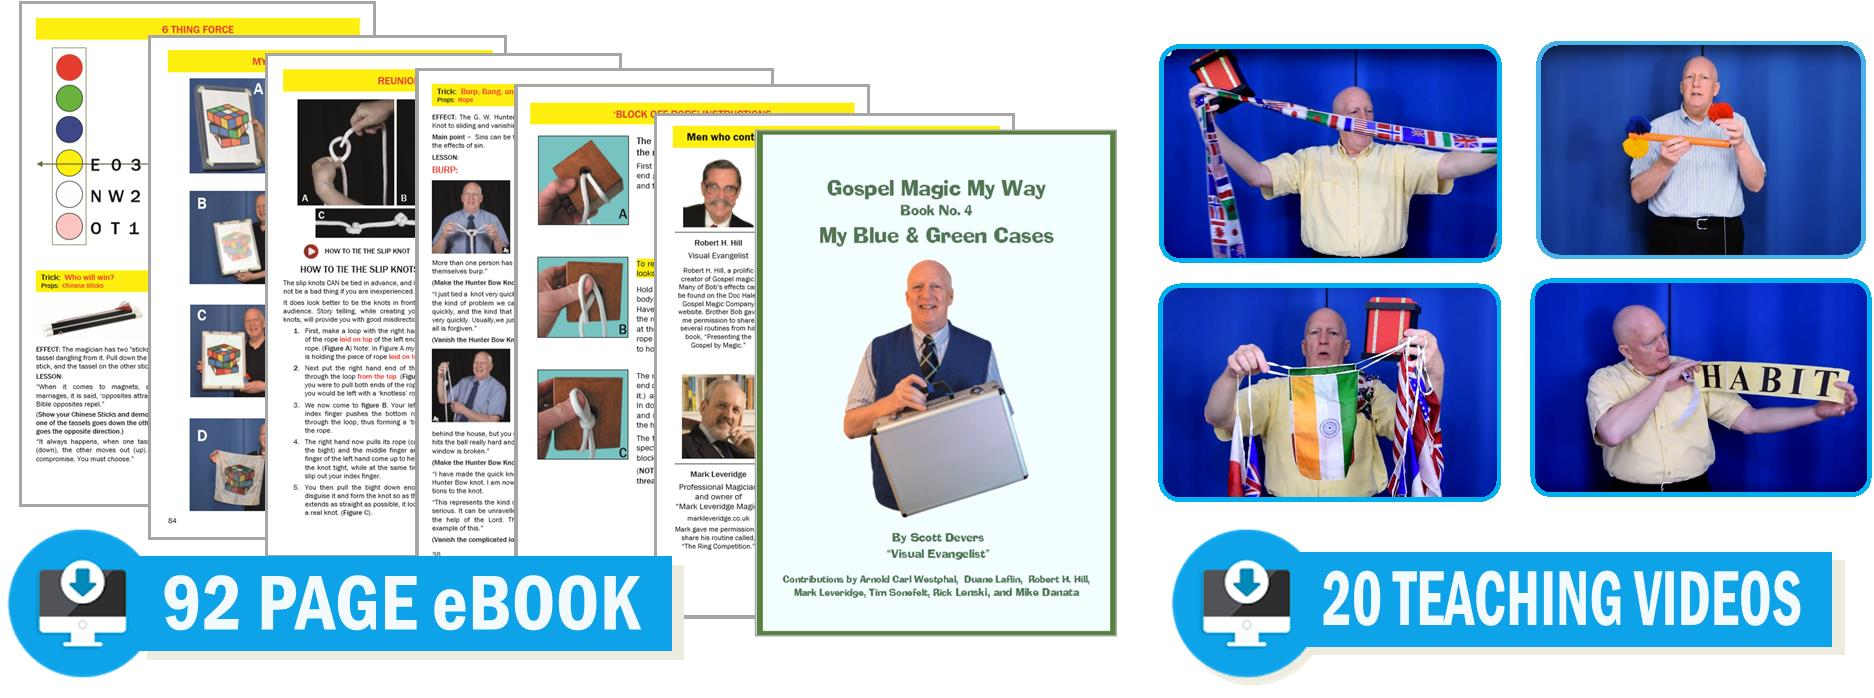 60-great-gospel-magic-tricks-contents.jpg